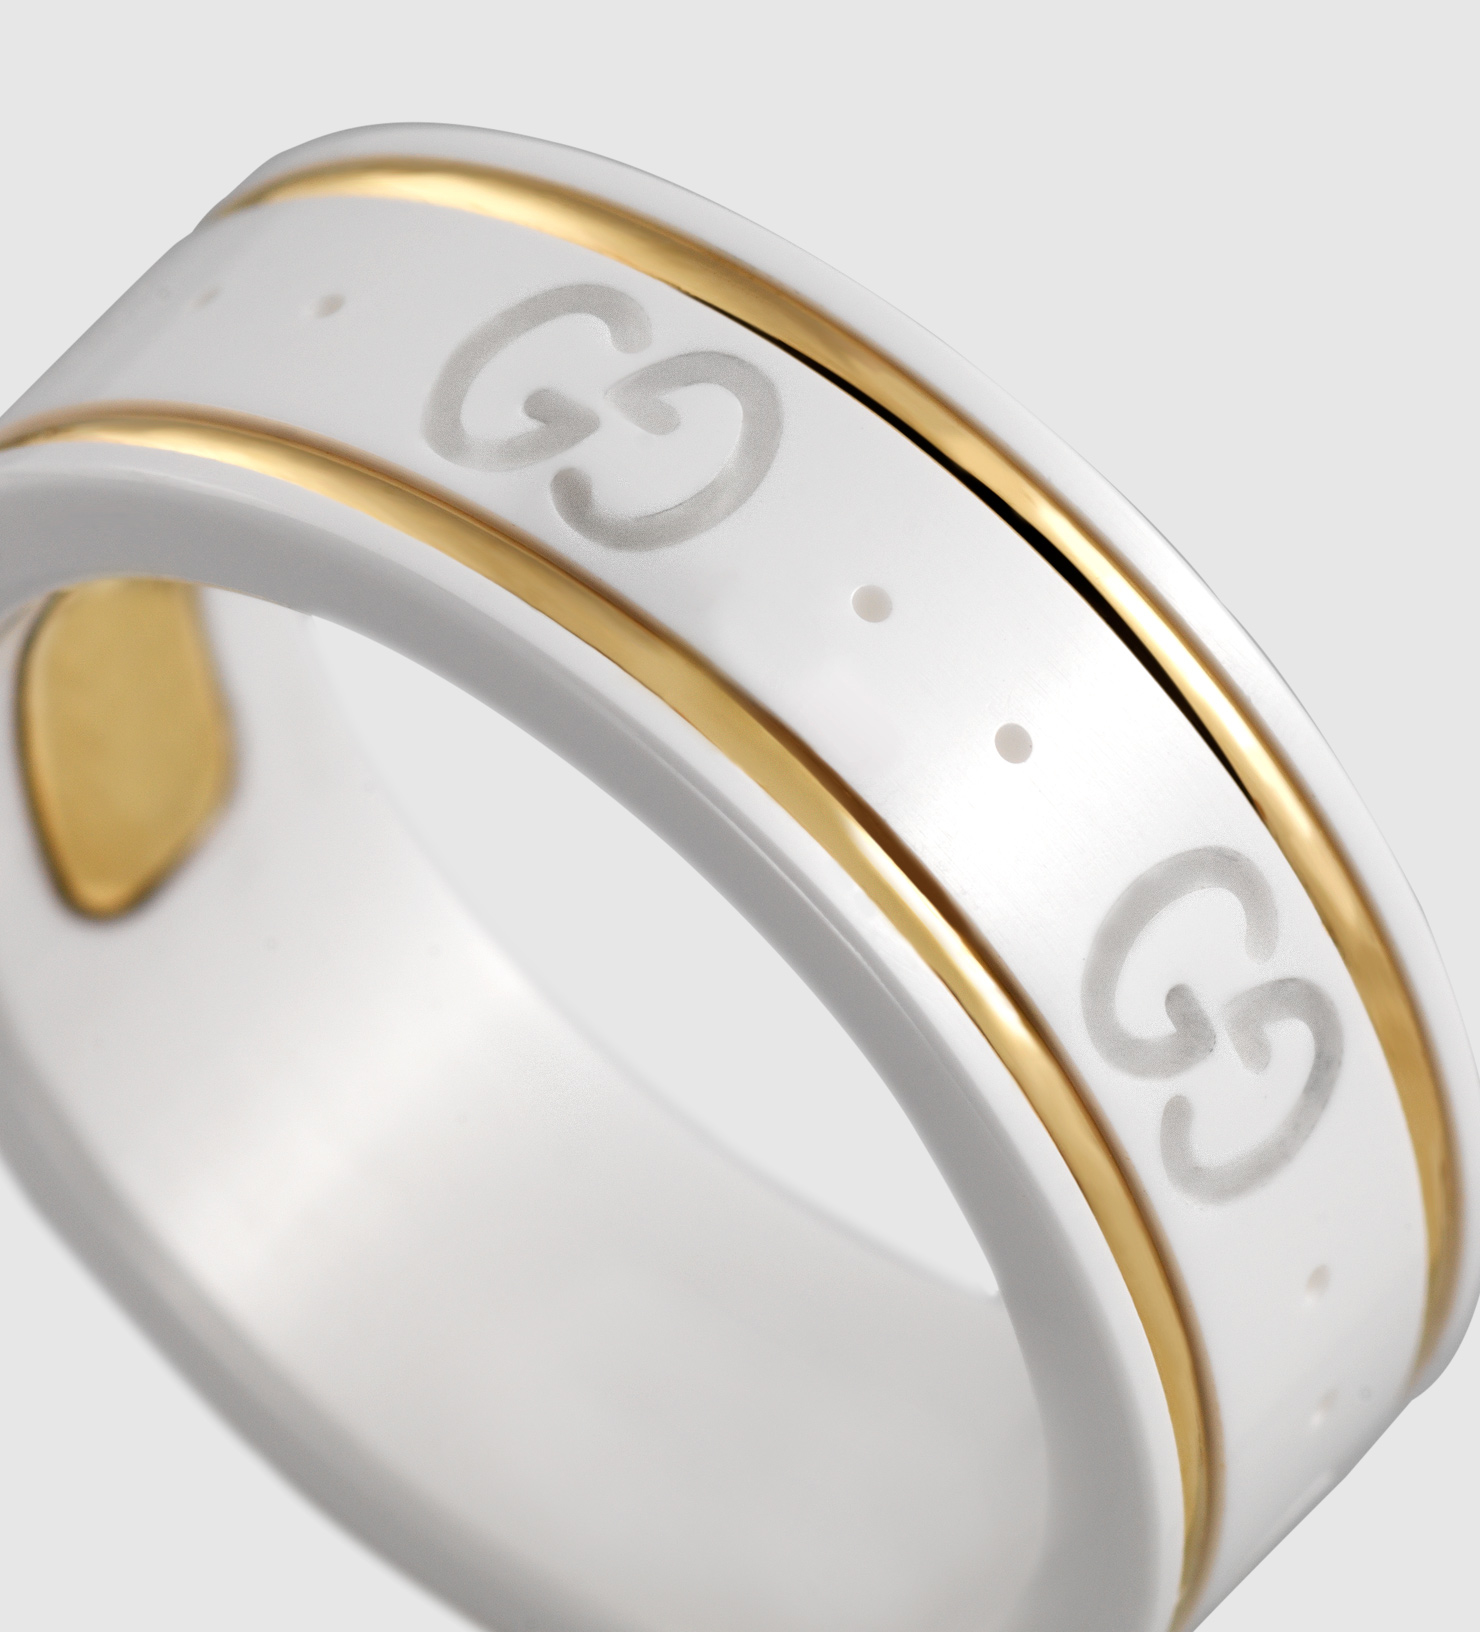 cbdcae26c75 Gucci Icon Ring In Yellow Gold And White Zirconia Powder in Yellow ...